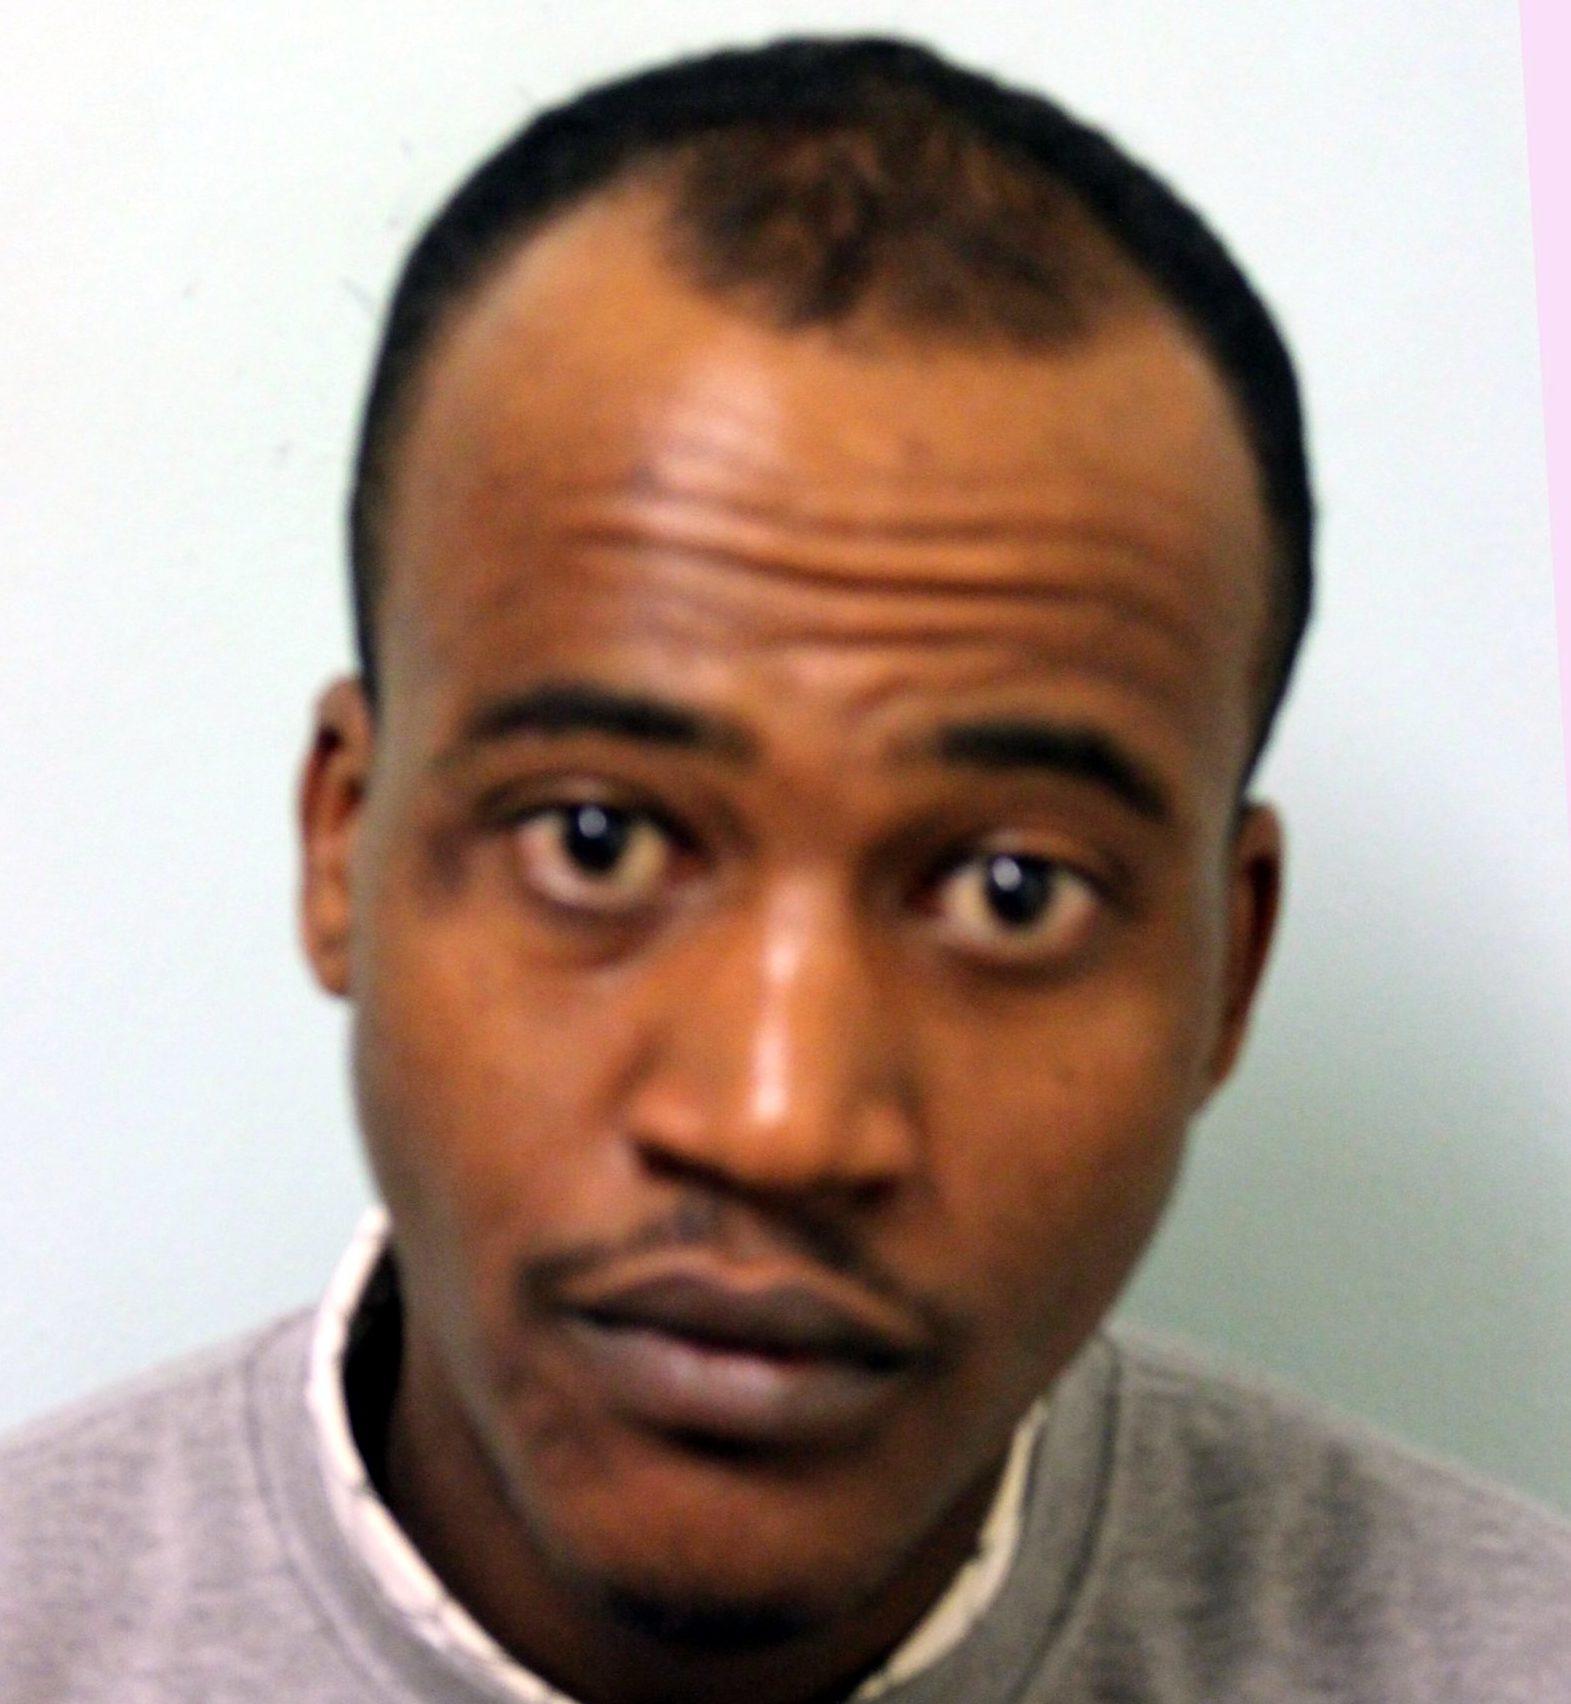 Jail for Ethiopian sex attacker